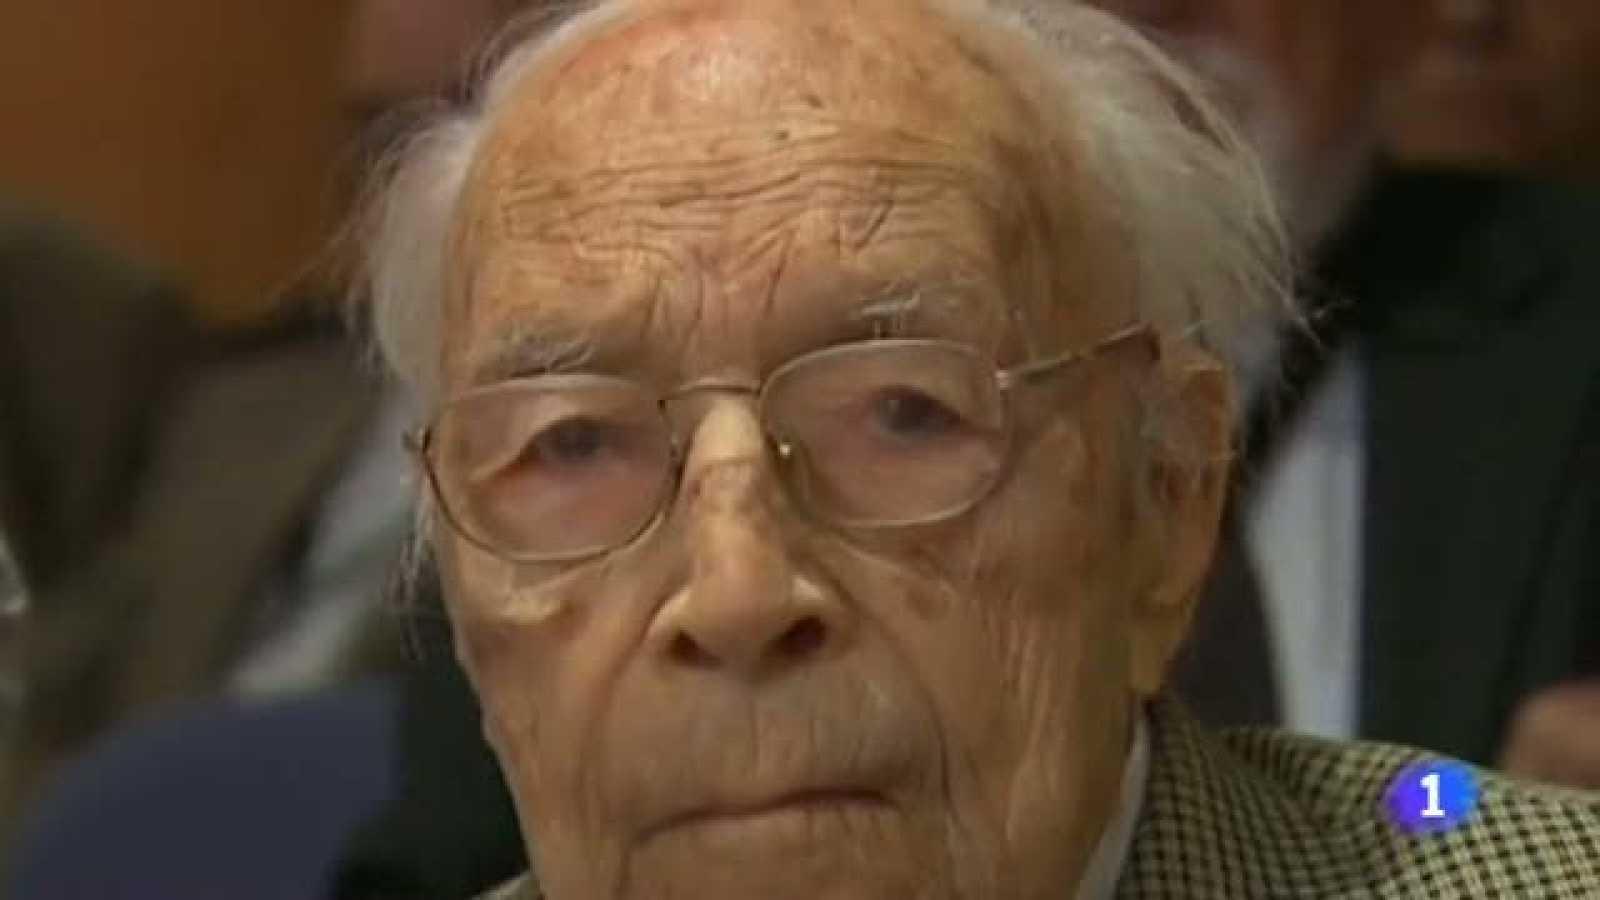 L'informatiu migdia - Adéu al doctor Moisès Broggi